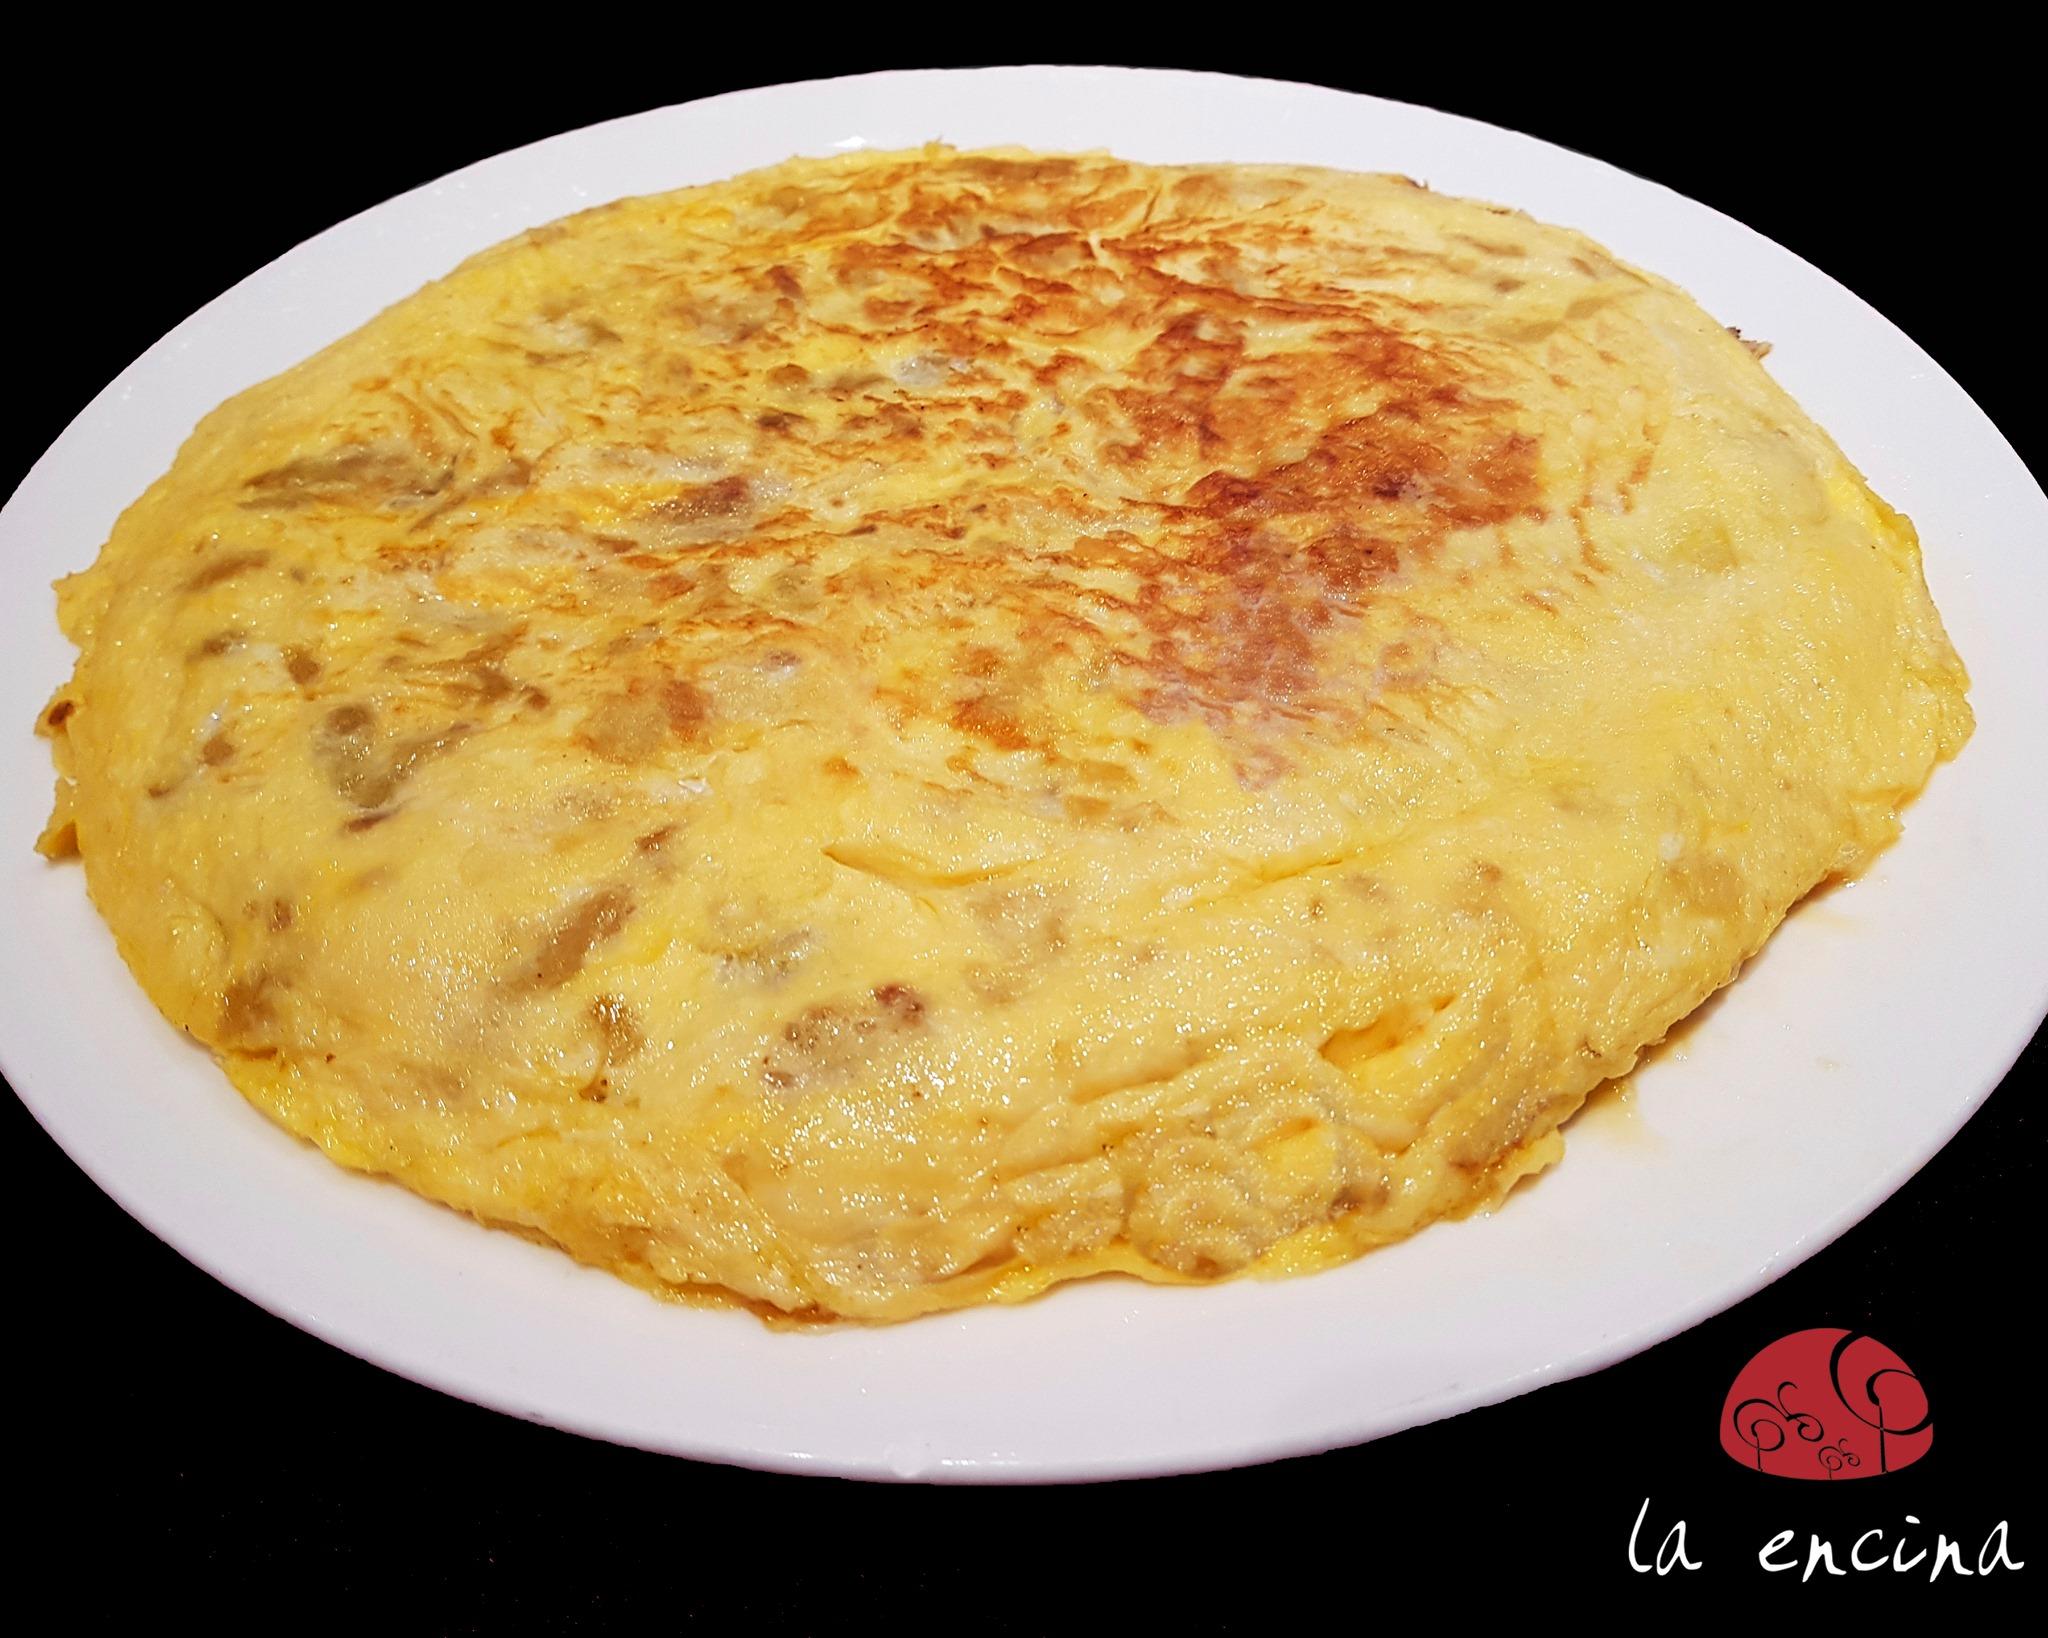 La truita de patates de Ciri González   Facebook Restaurant La Encina